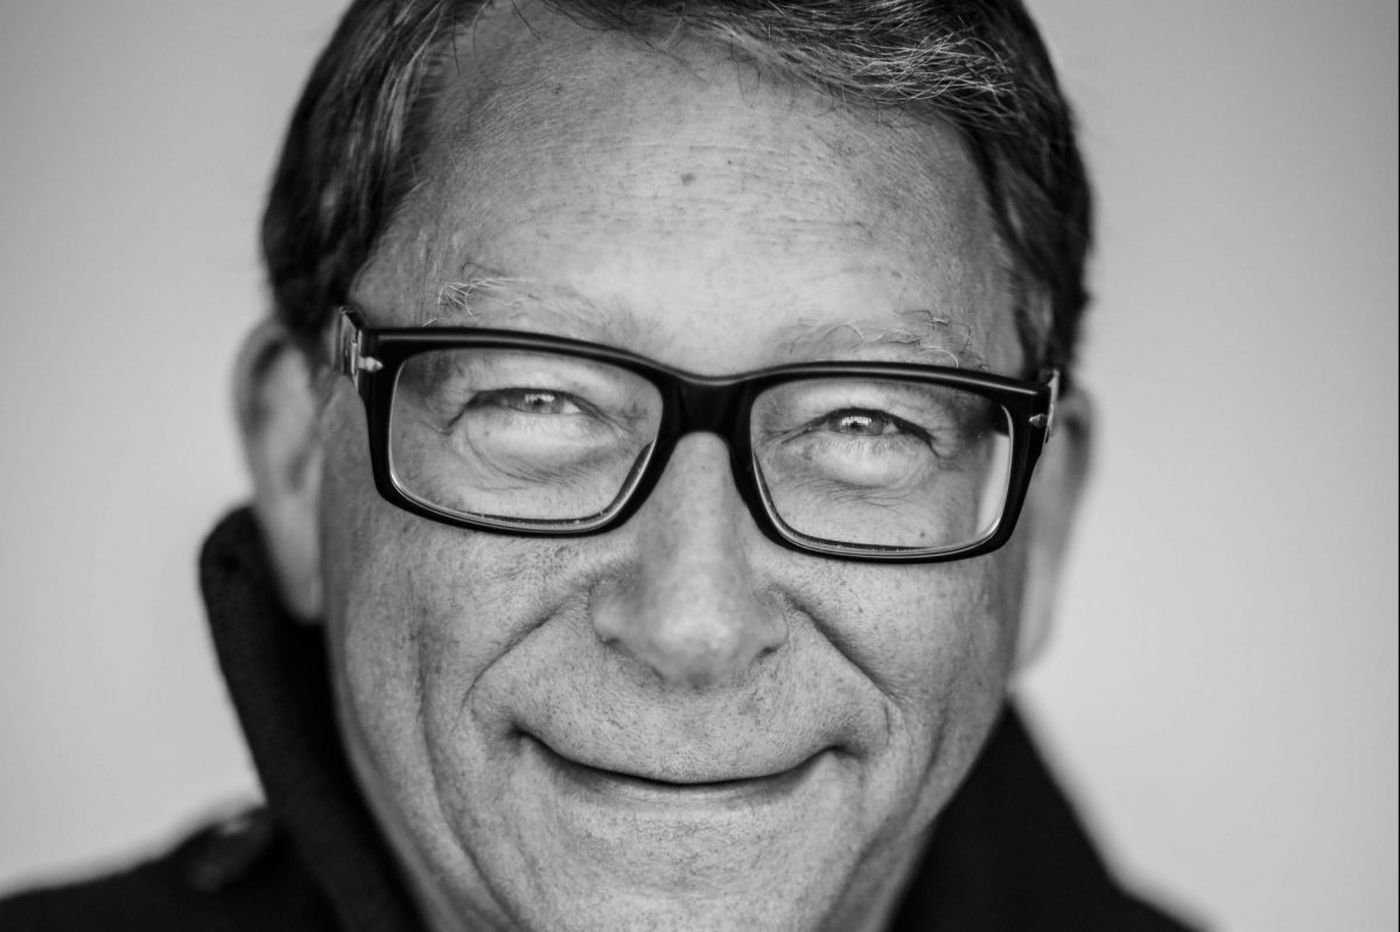 Luxury shoe designer Stuart Weitzman is the new namesake of University of Pennsylvania's design school